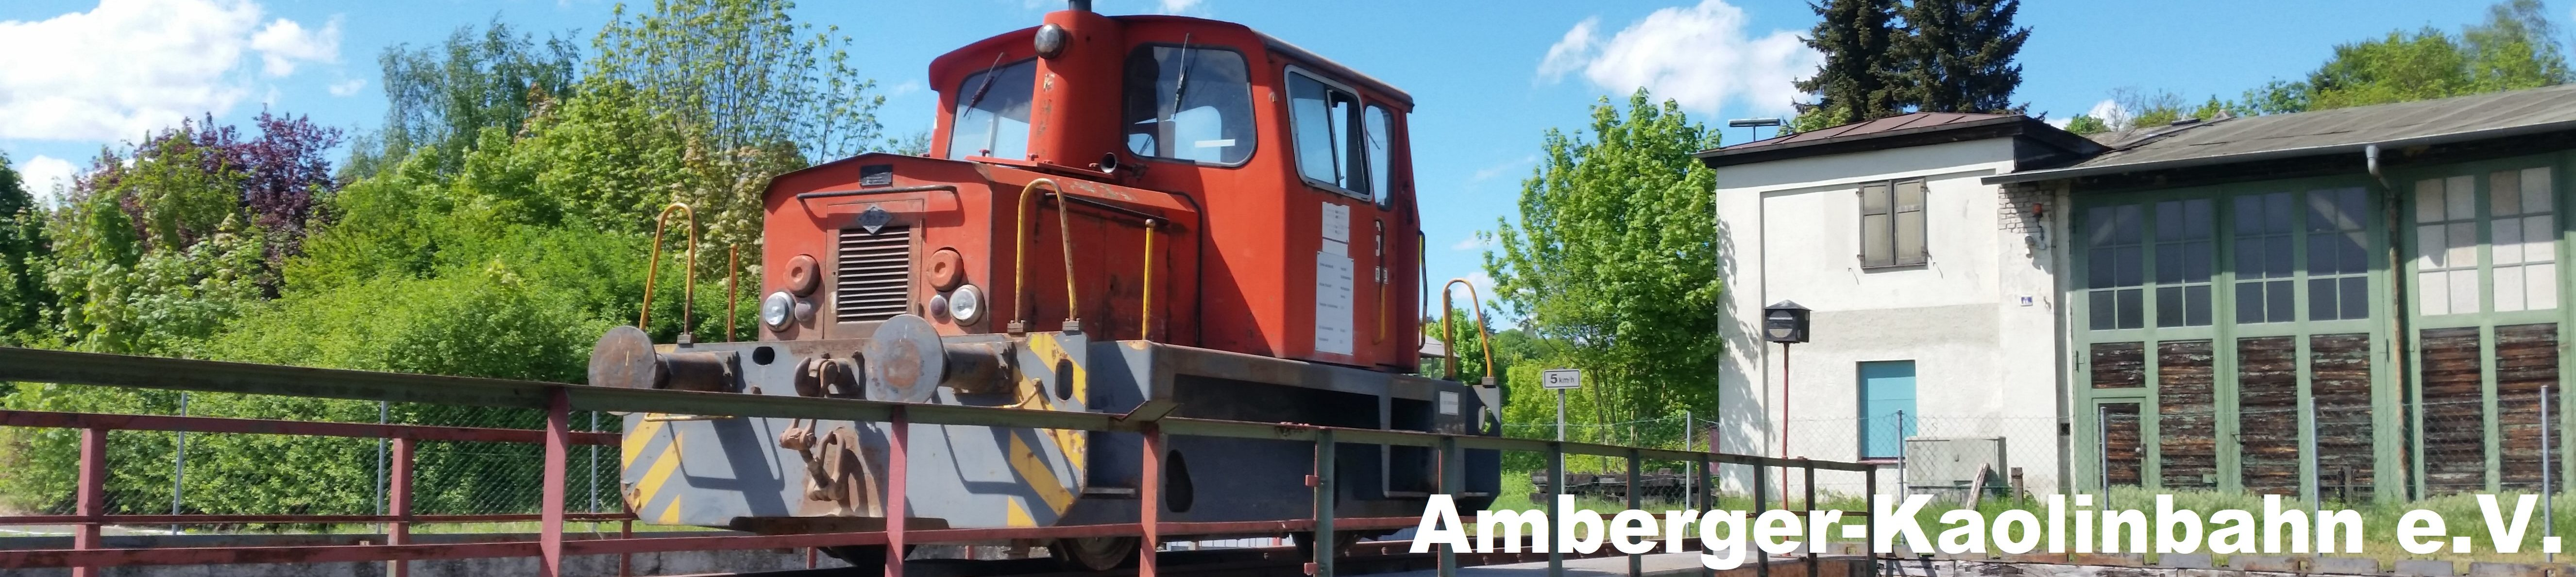 Amberger Kaolinbahn e.V.